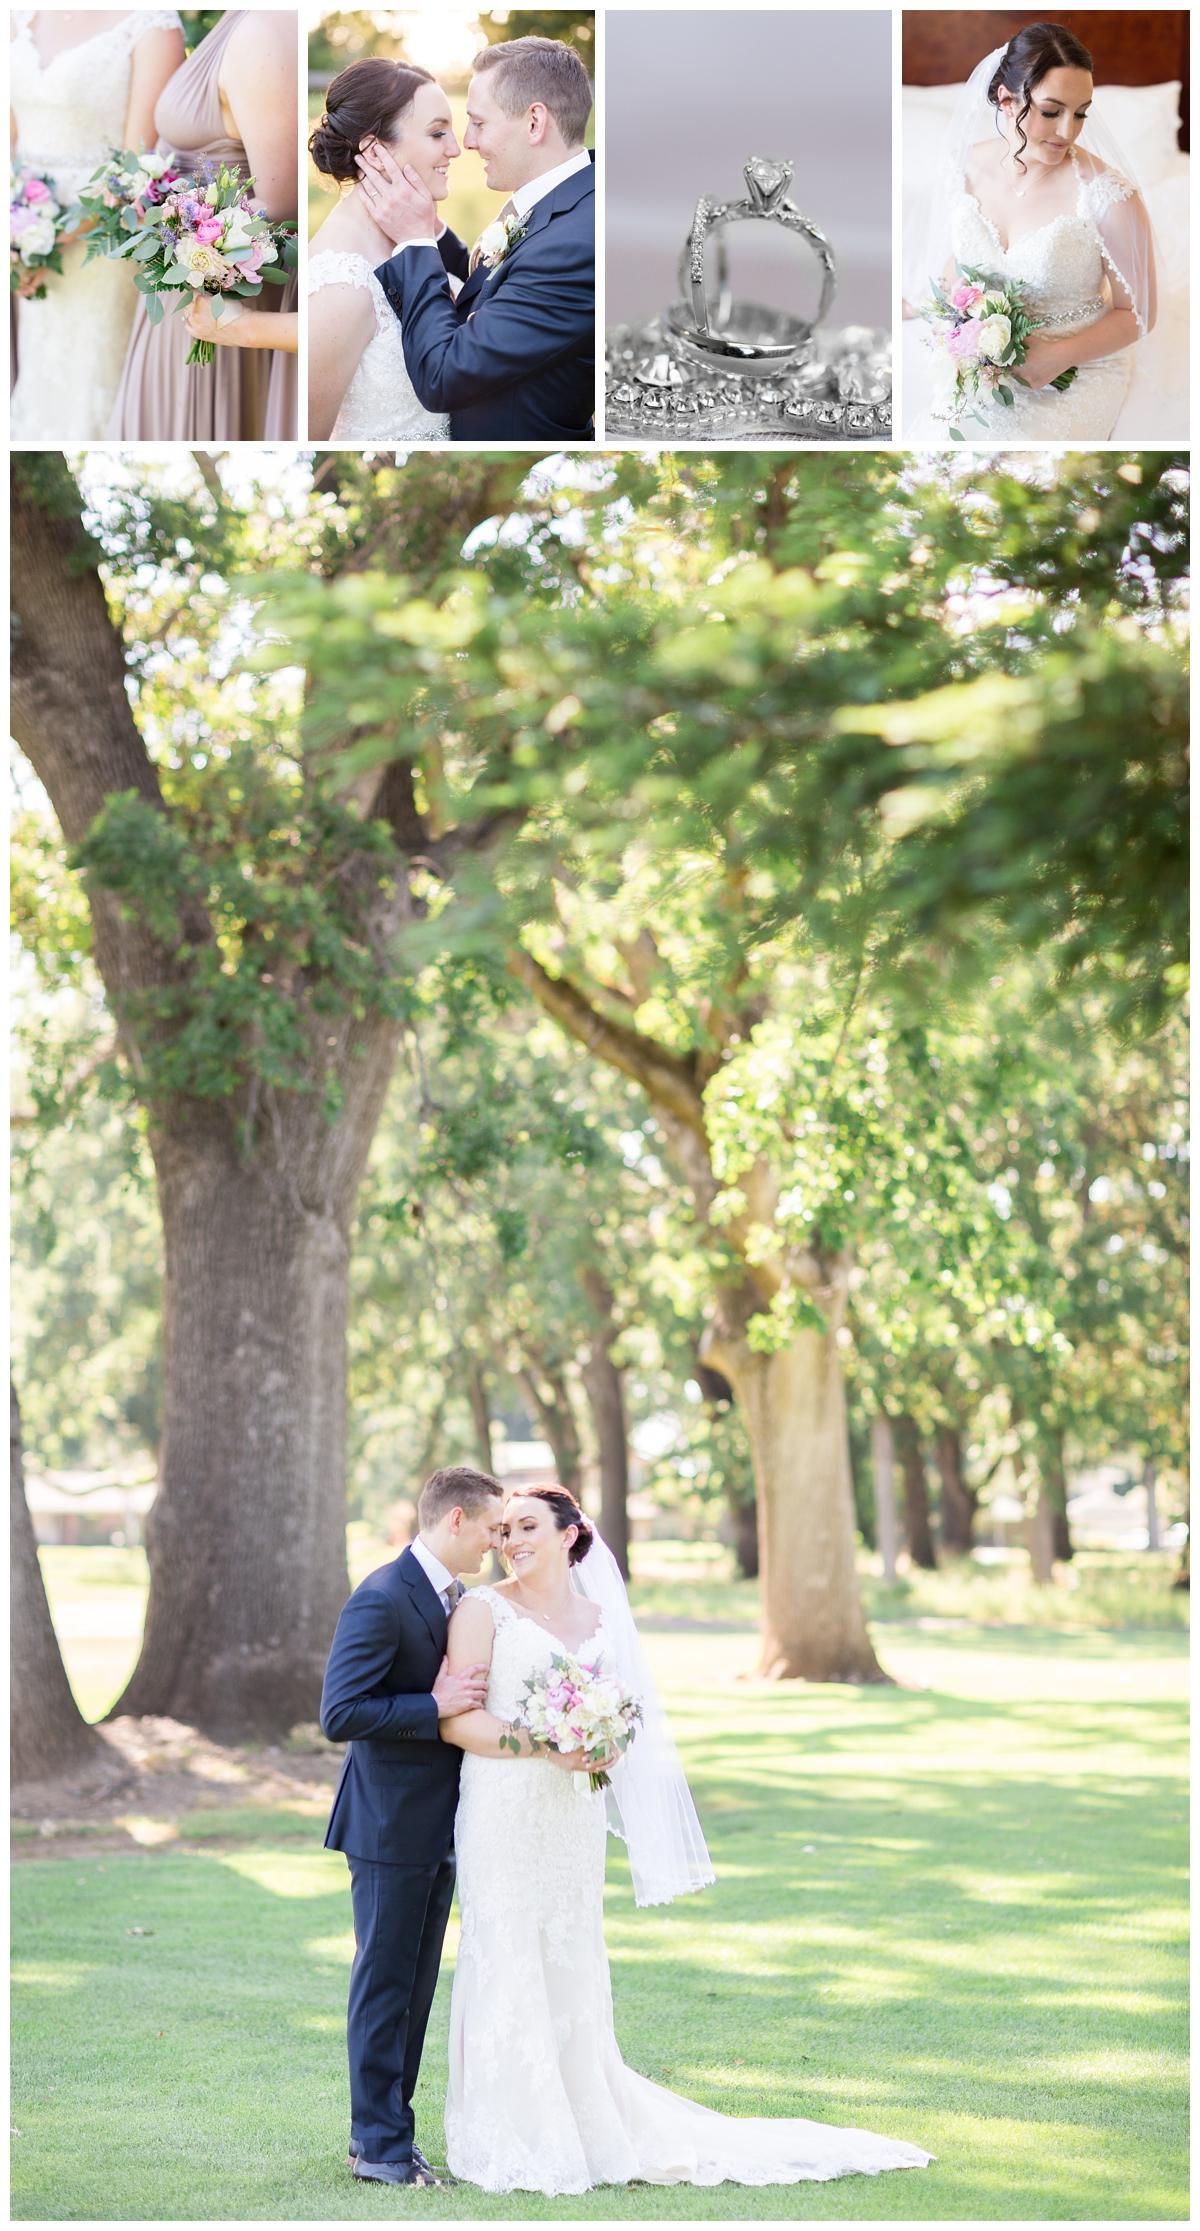 Butte-Creek-Country-Club-Wedding-Photography_5281.jpg